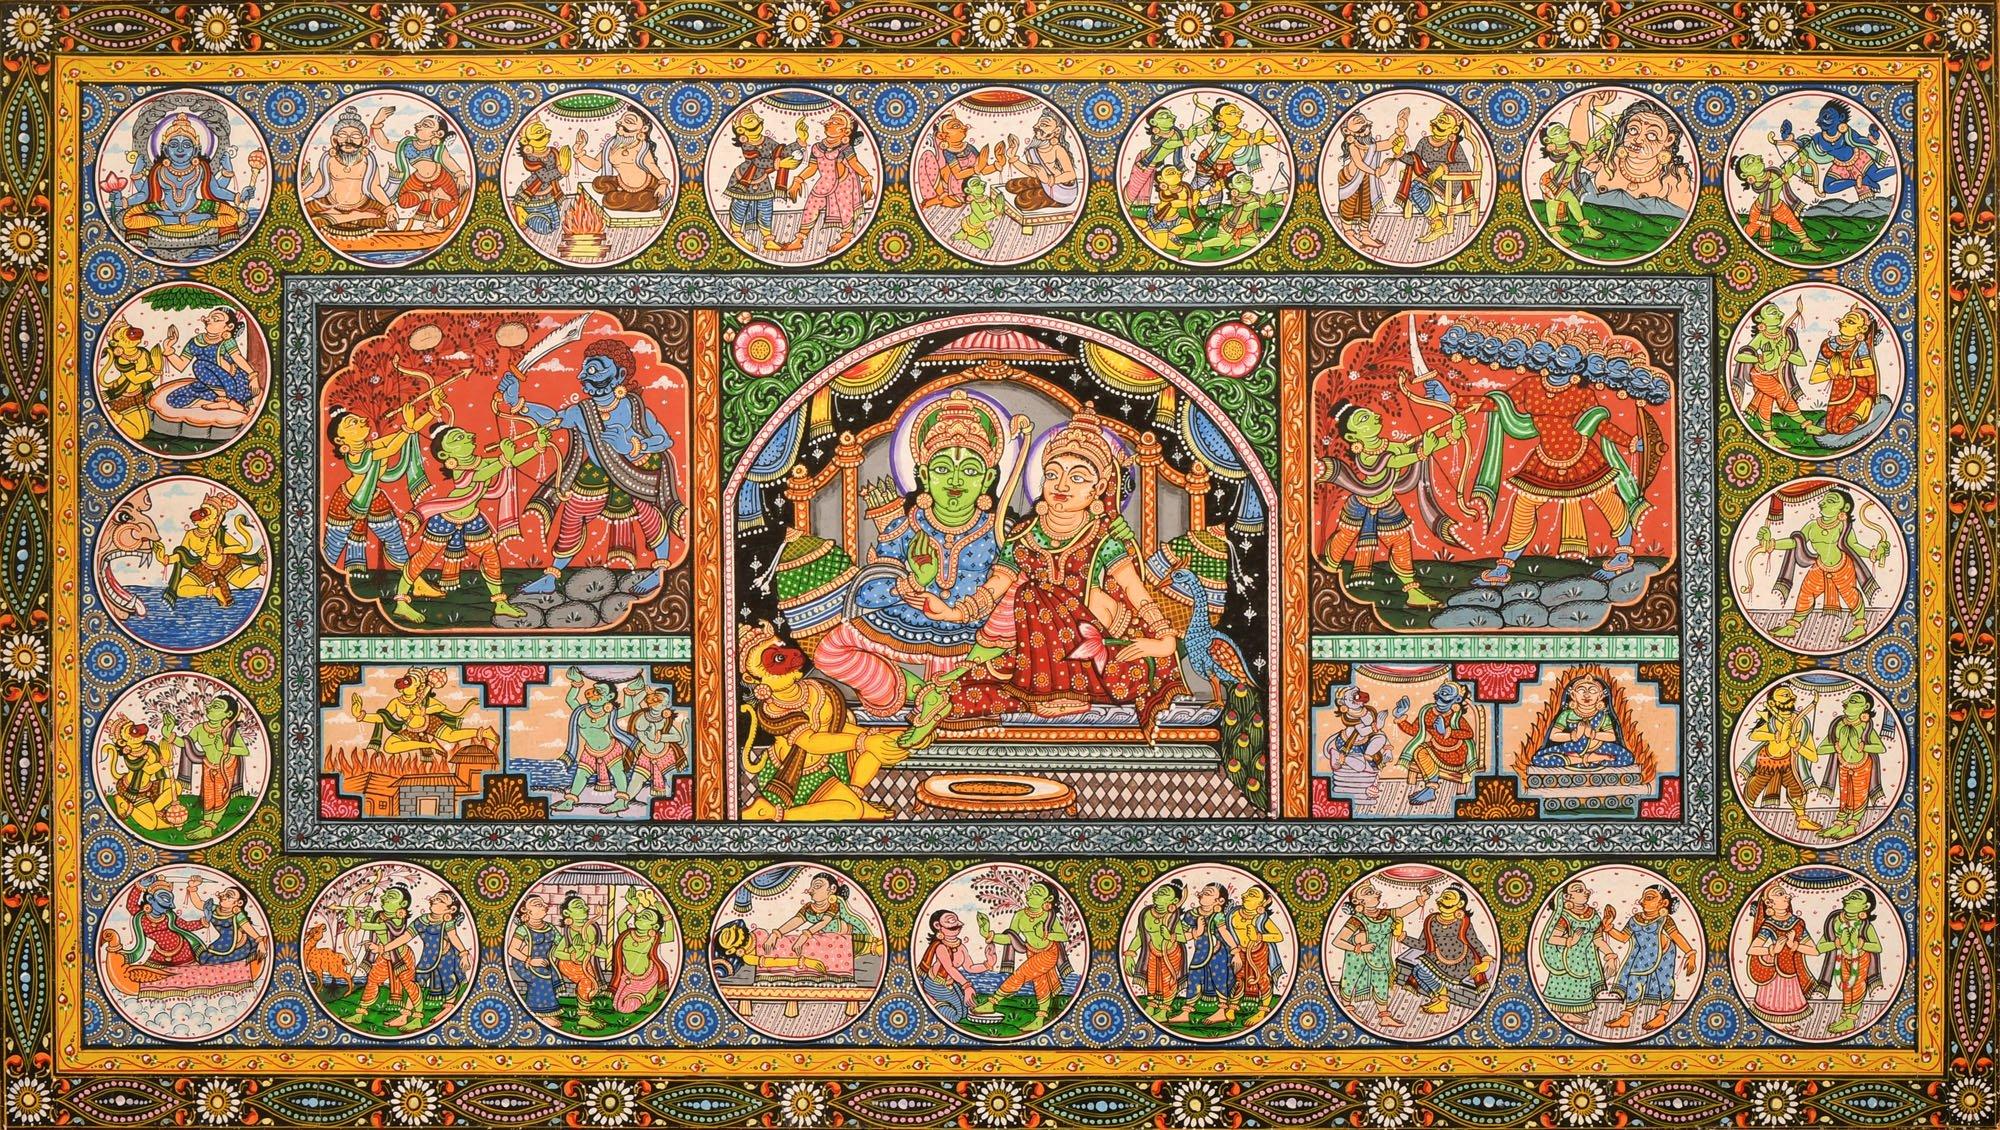 Shri Rama Lila - Water Color Painting on Patti - Folk Art From The Temple Town Puri (Orissa) - Artis